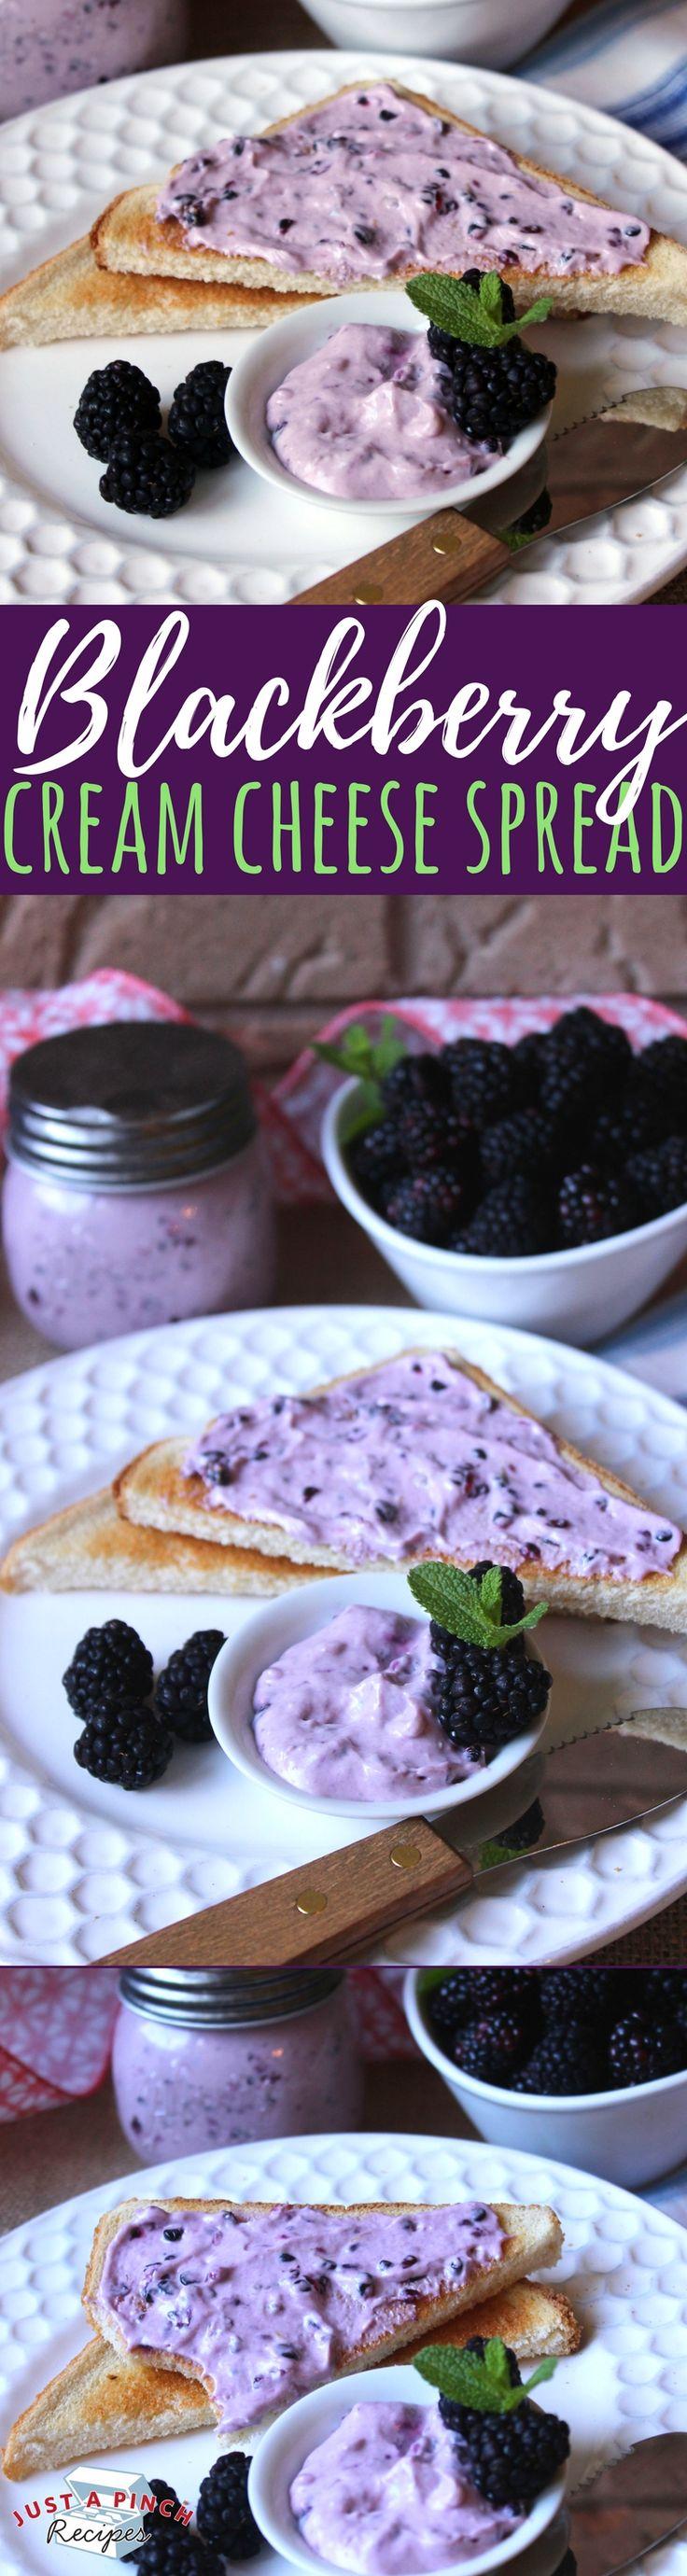 Easy Homemade Blackberry Cream Cheese Spread